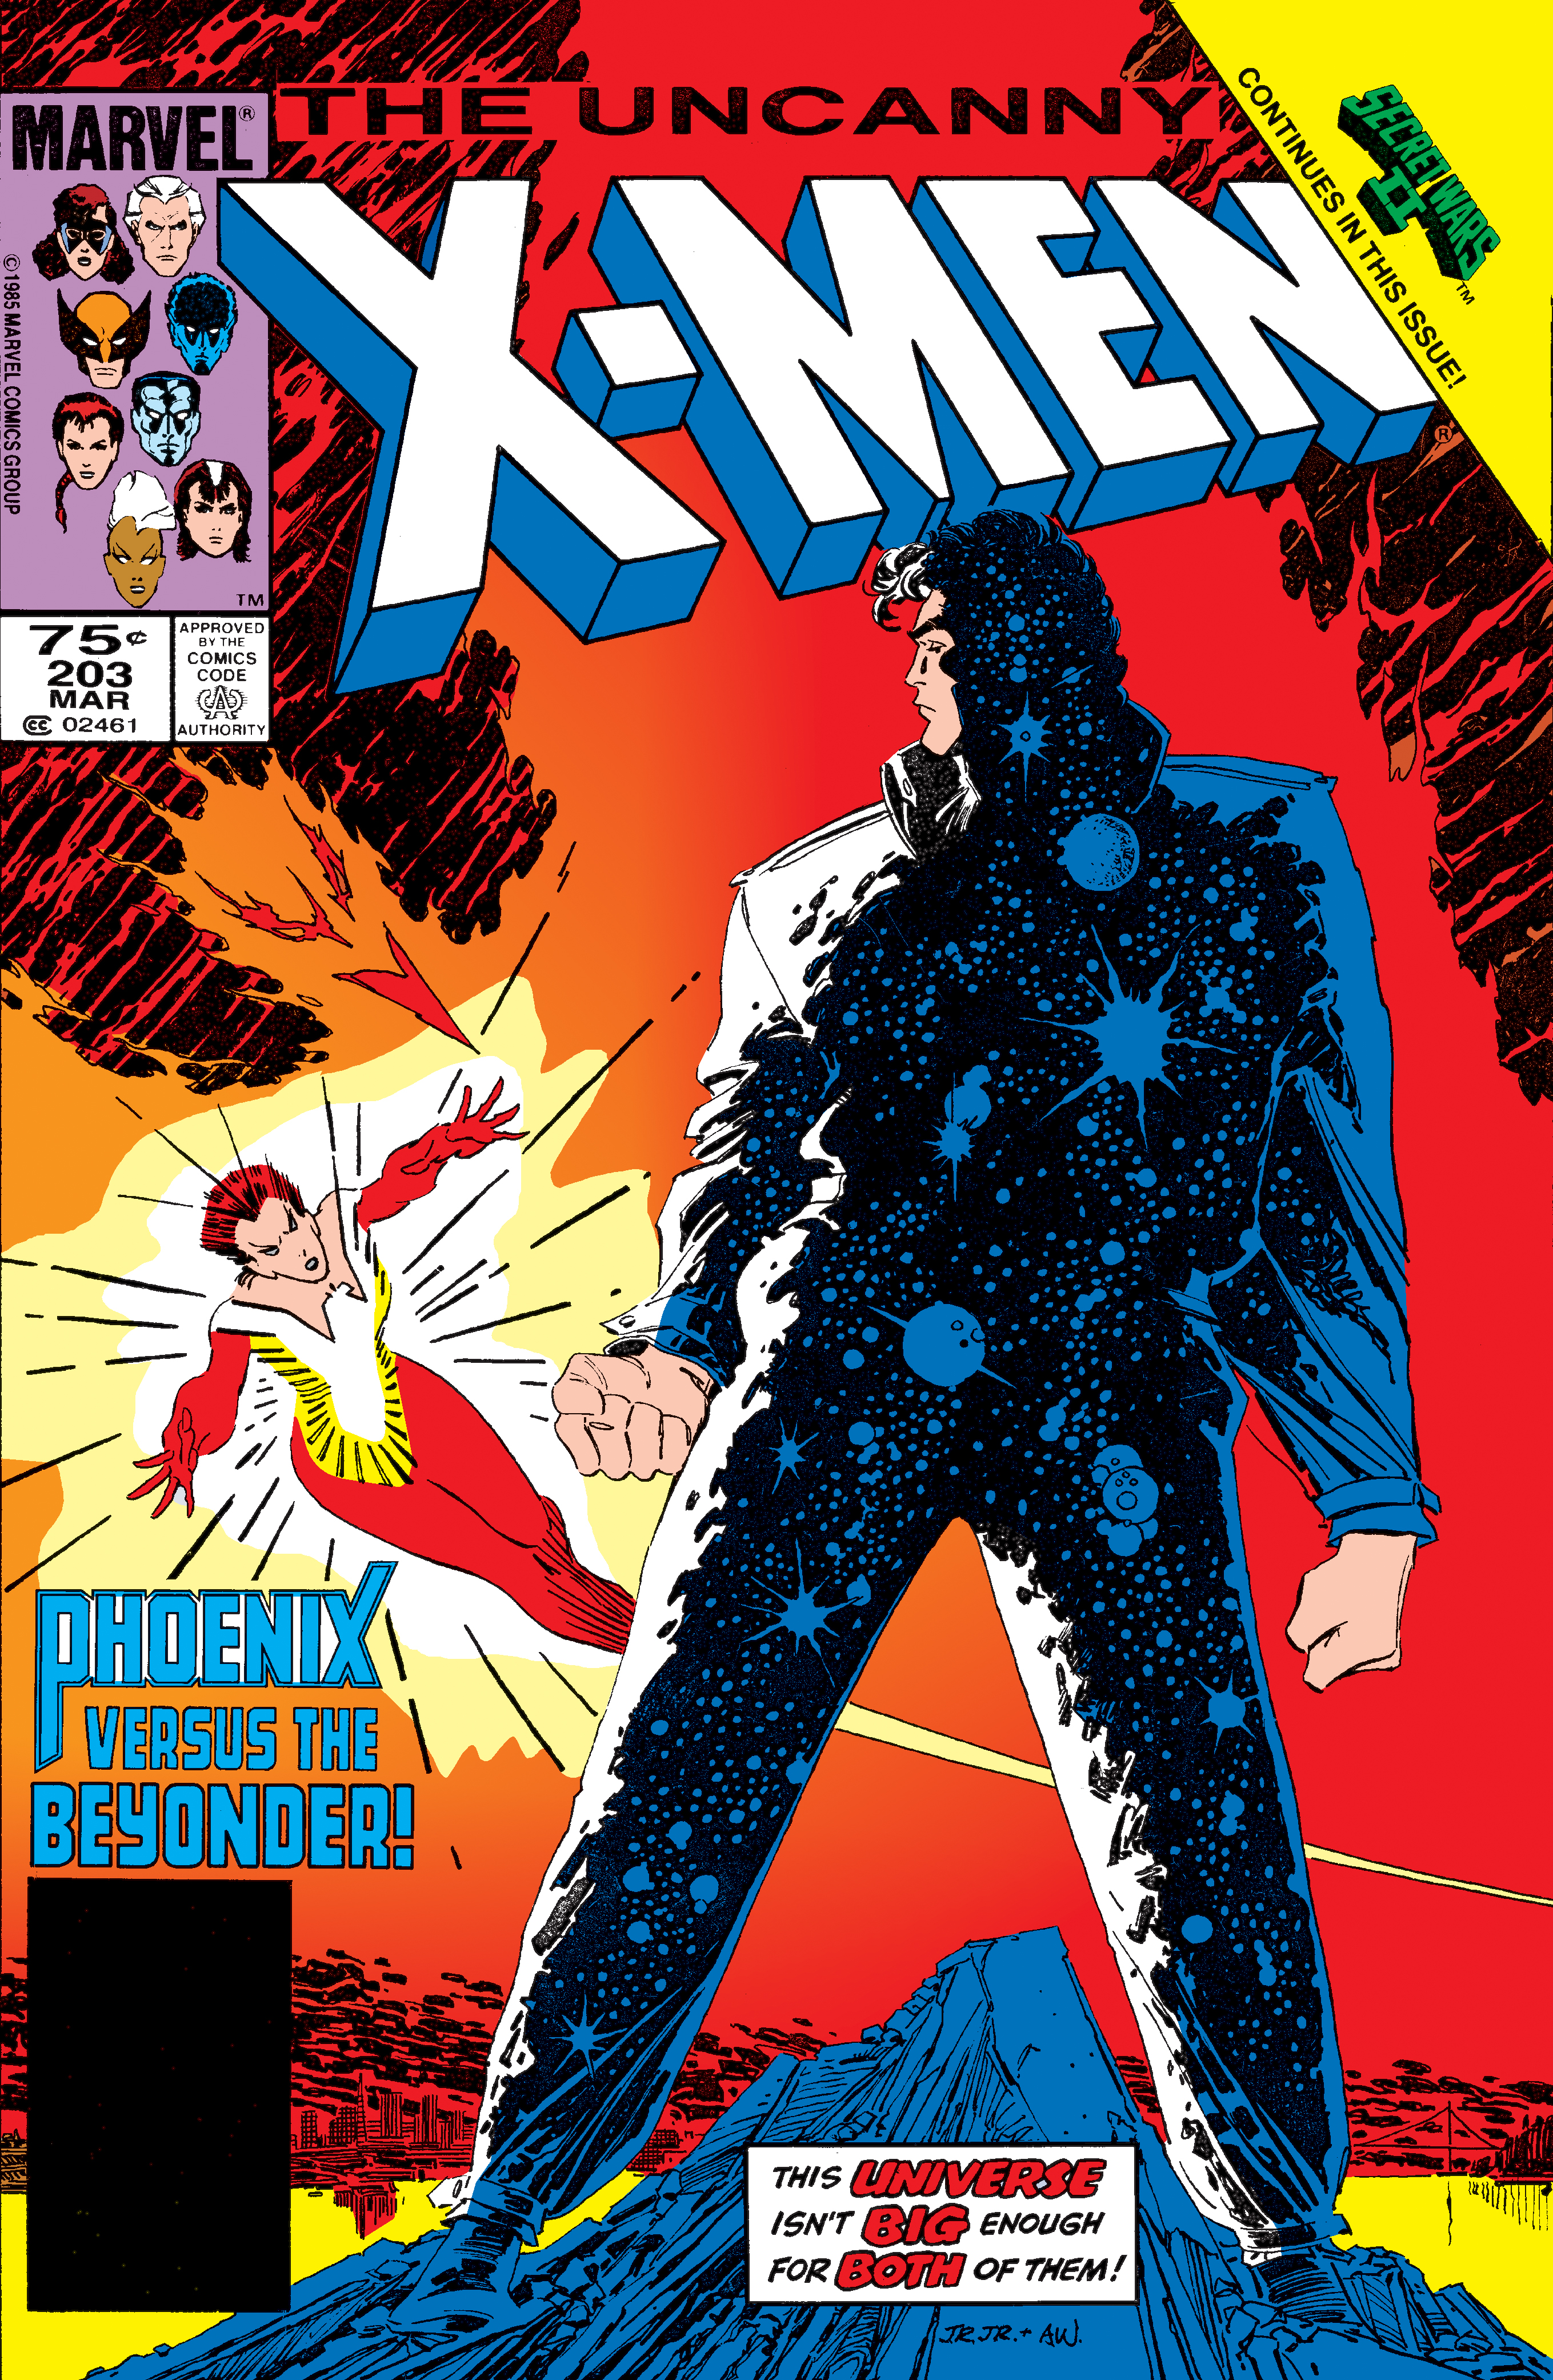 Uncanny X-Men (1963) #203